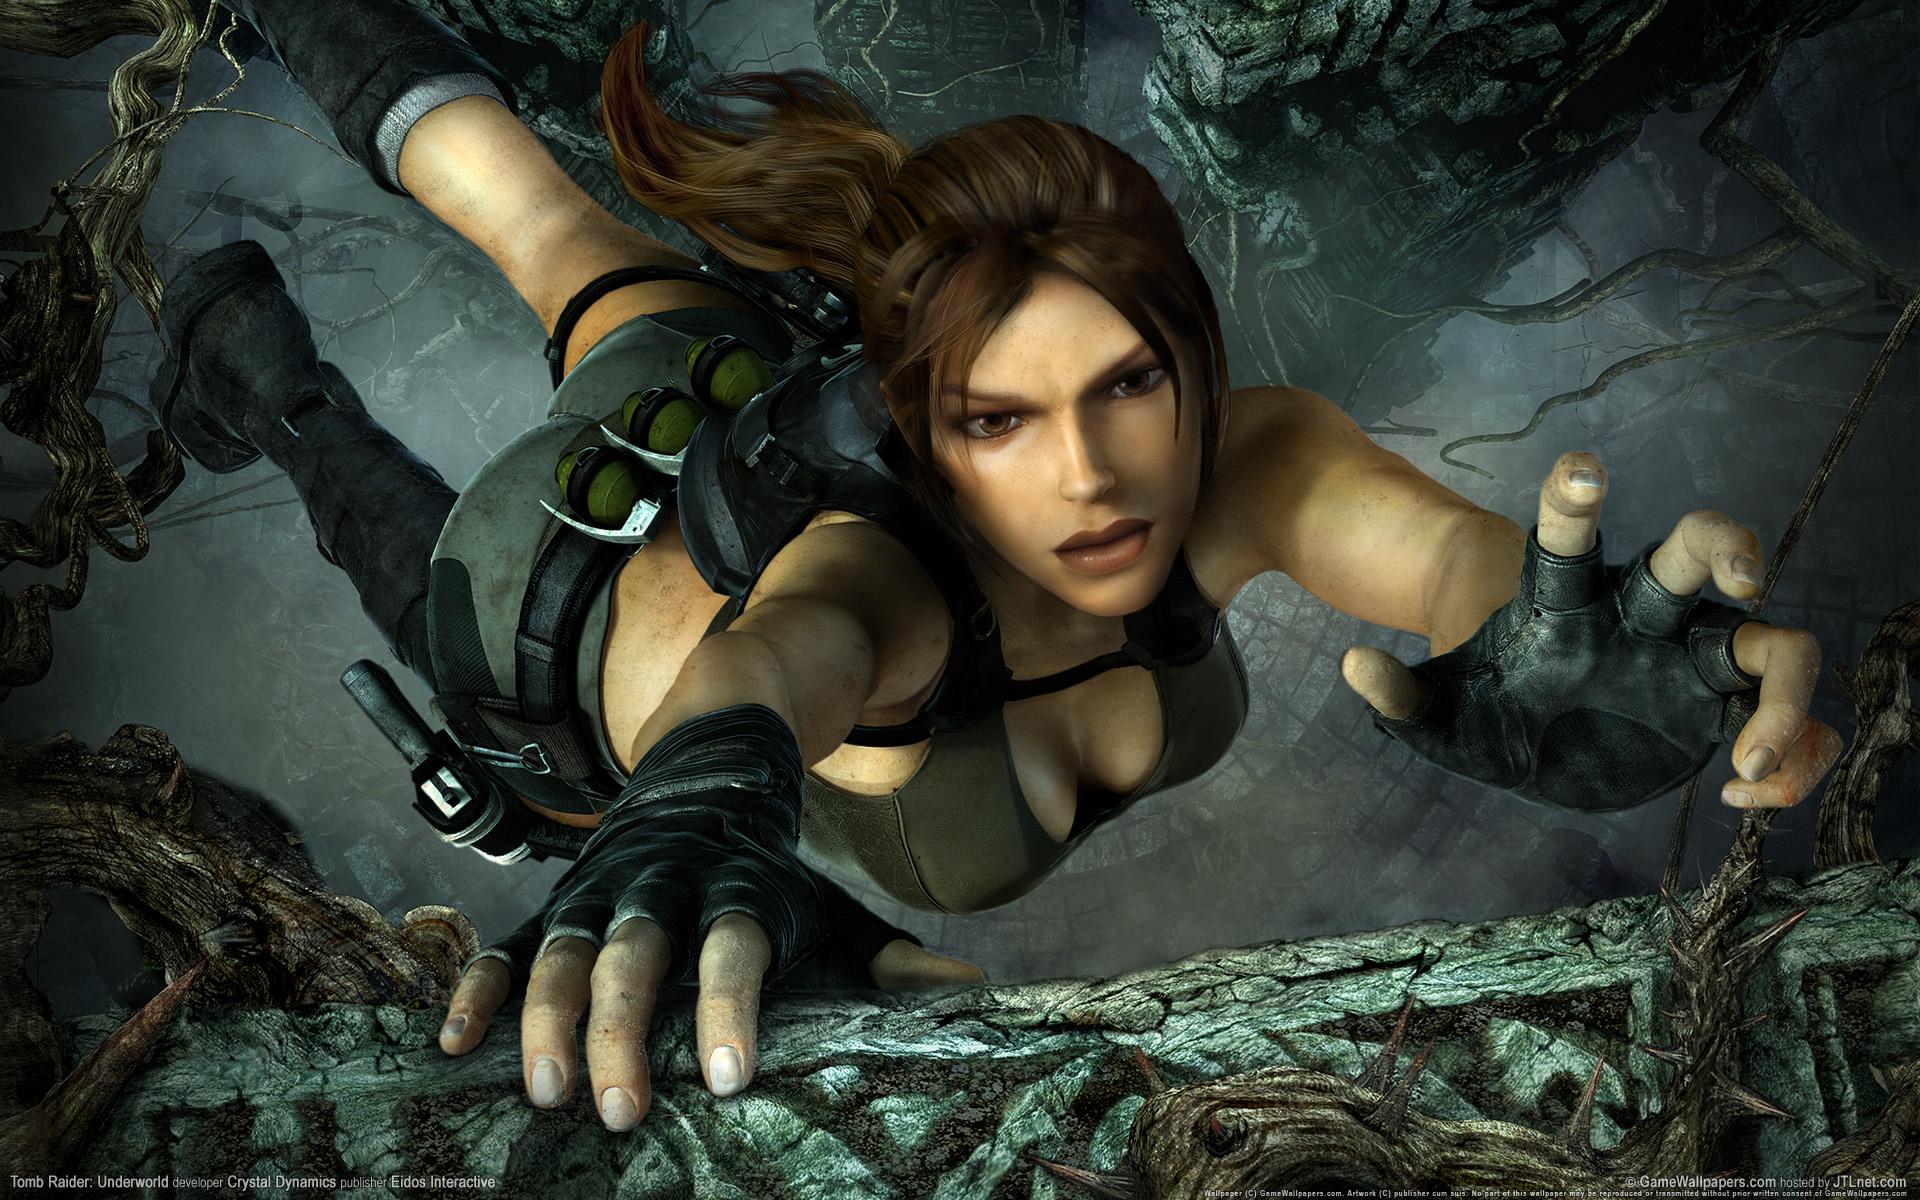 HD Wallpapers Tomb Raider Underworld